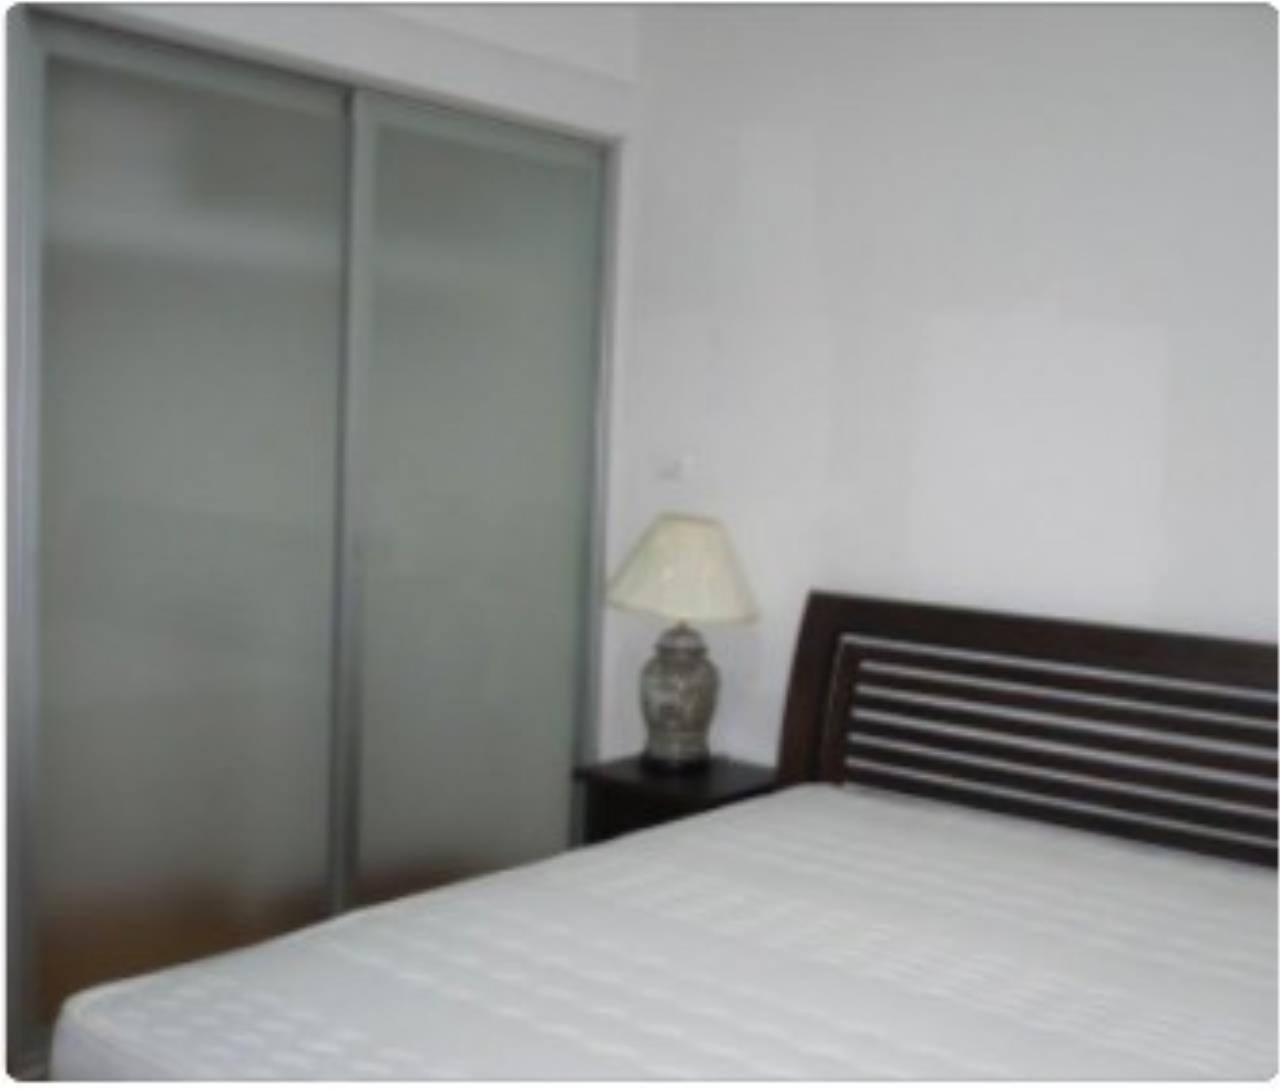 Agent - Mayteekul Sujirapinyokul Agency's AC2180418 For Rent Condo Supalai Premier Place Asoke Condo MRT Phetchaburi 4